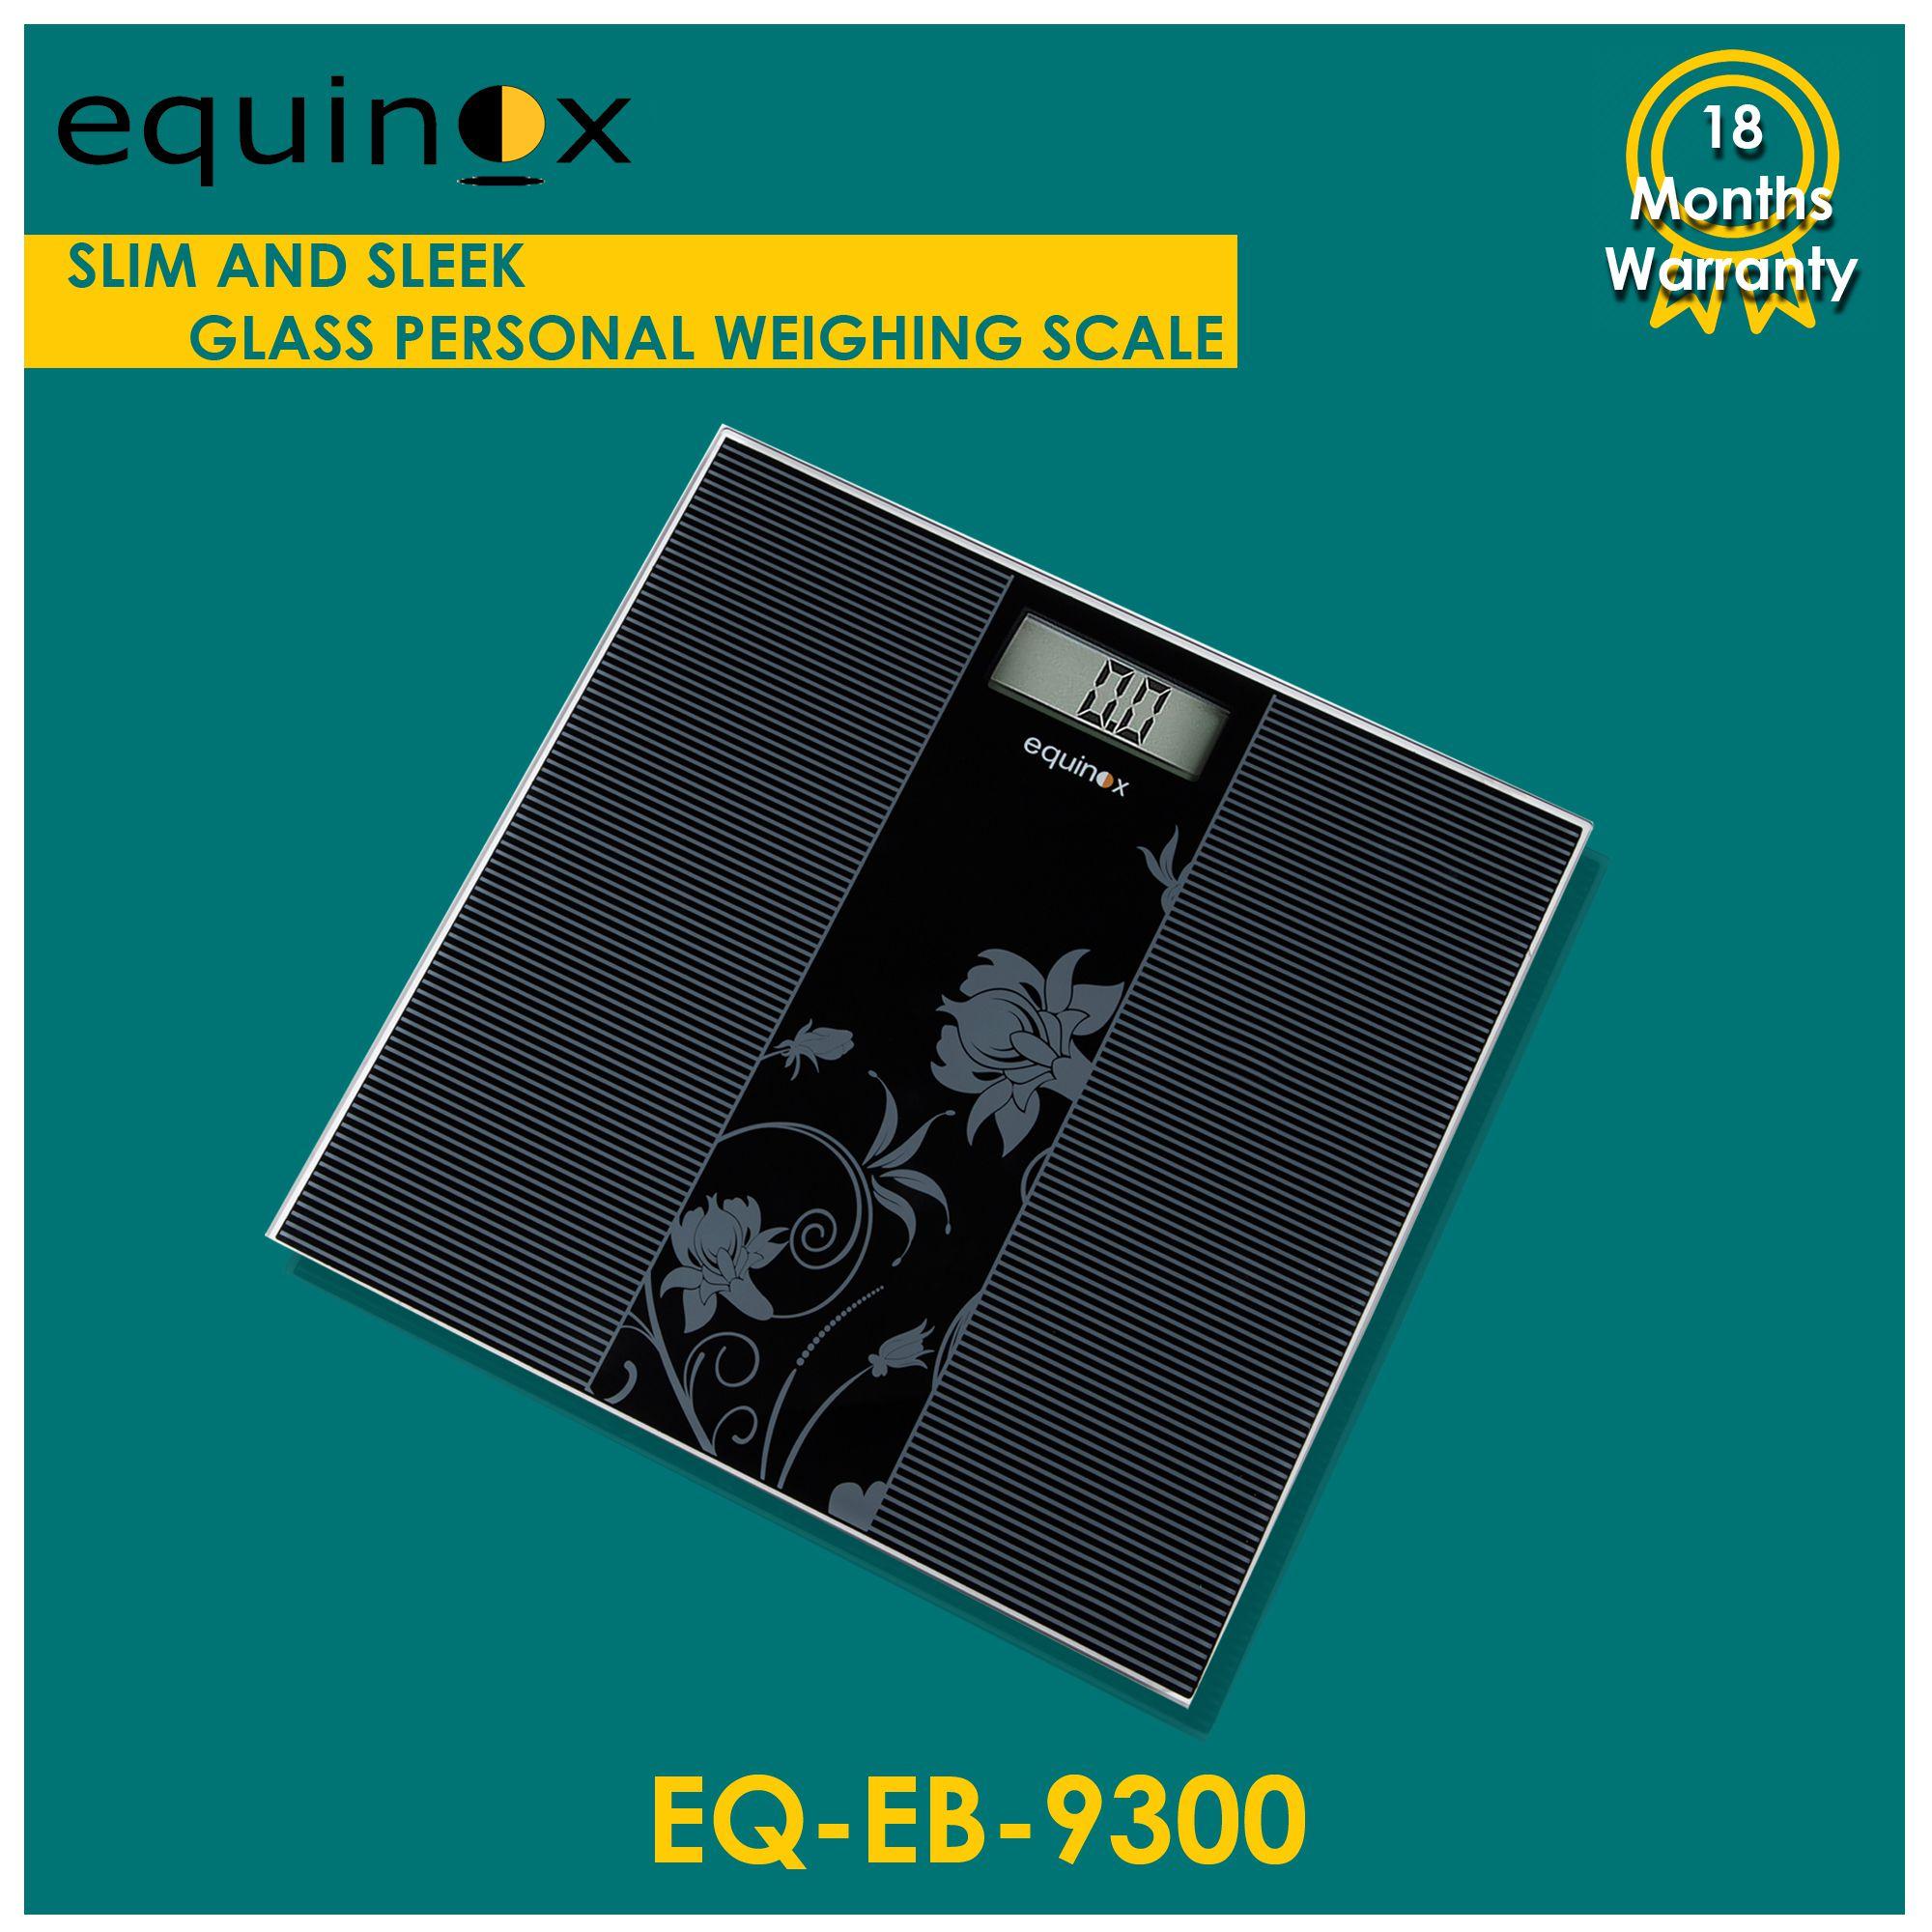 Equinox Digital Personal Weighing Scale- EQ-EB-9300